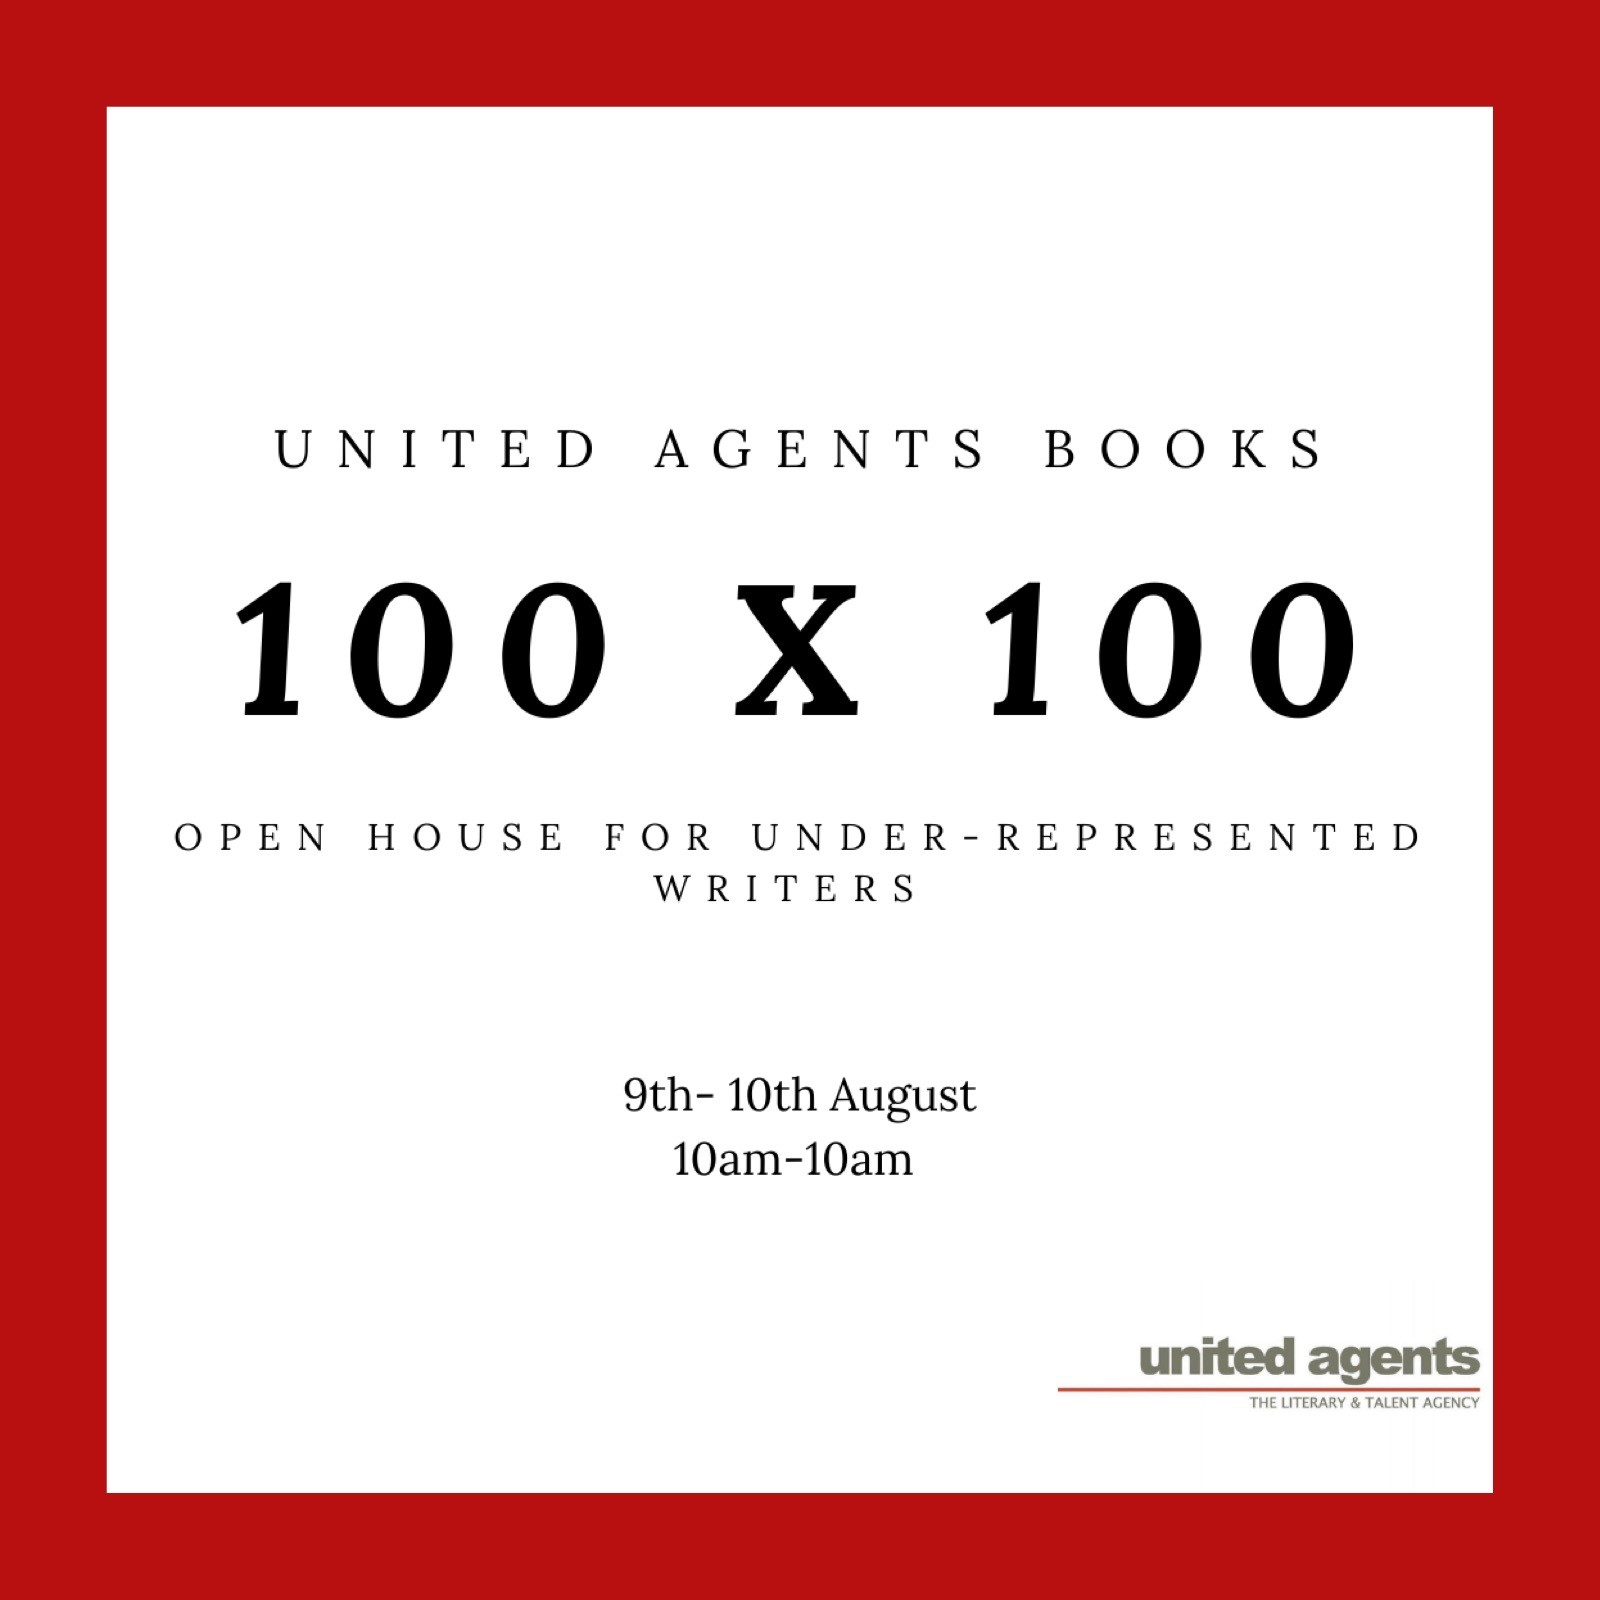 UA 100 Instagram 1 9TH AUG.jpg